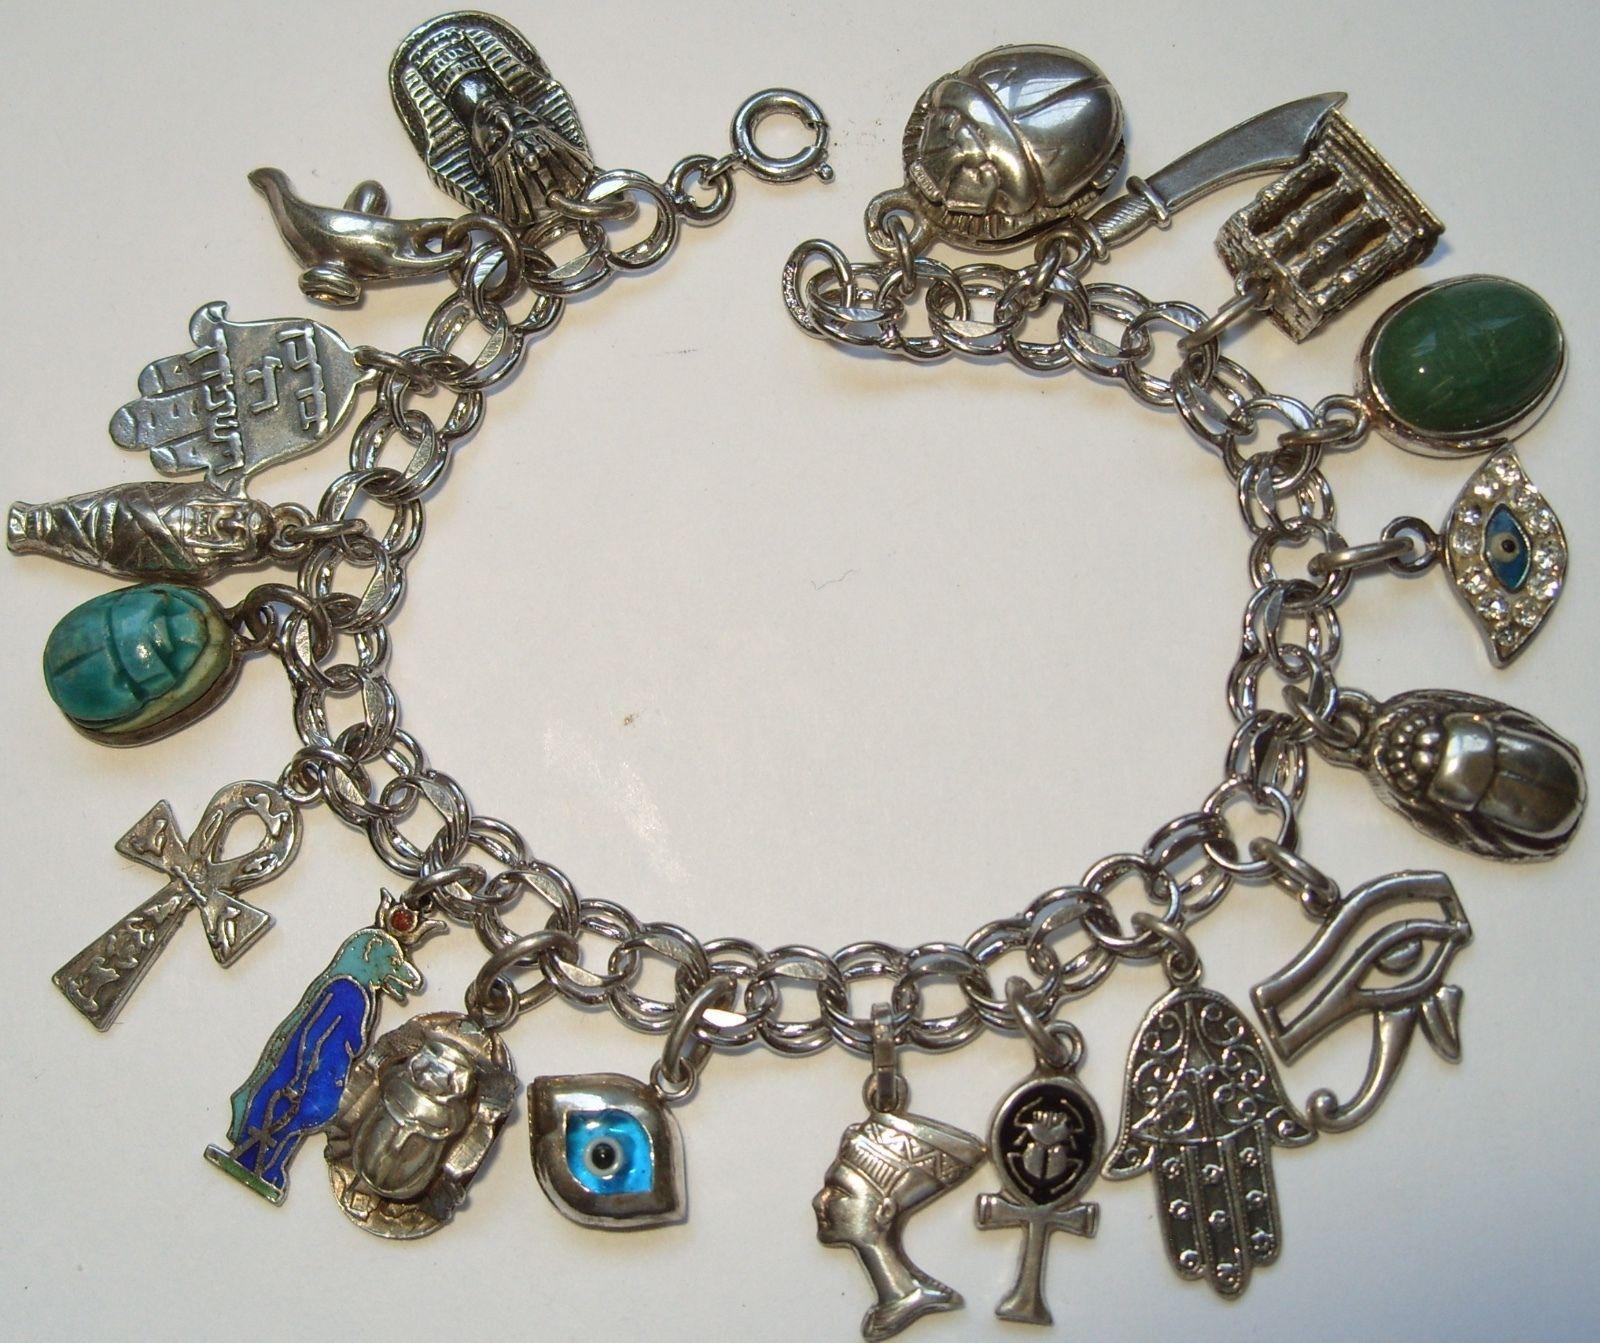 Vintage Sterling Silver Egyptian Charms Bracelet Enamel Evil Eyes